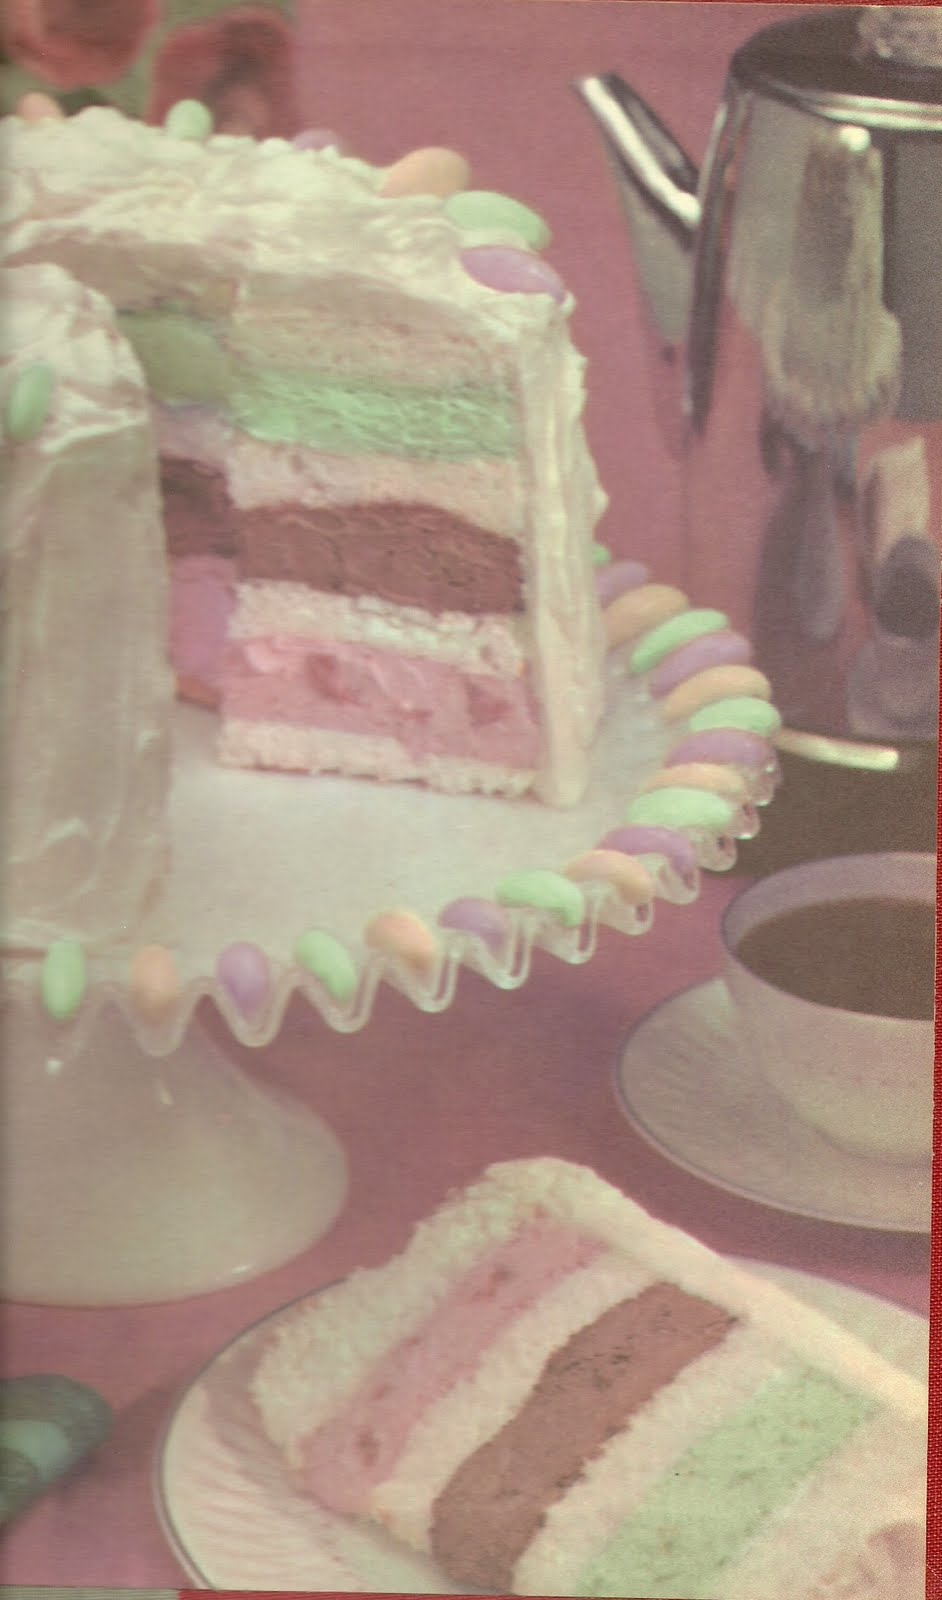 how to cut ice cream cake